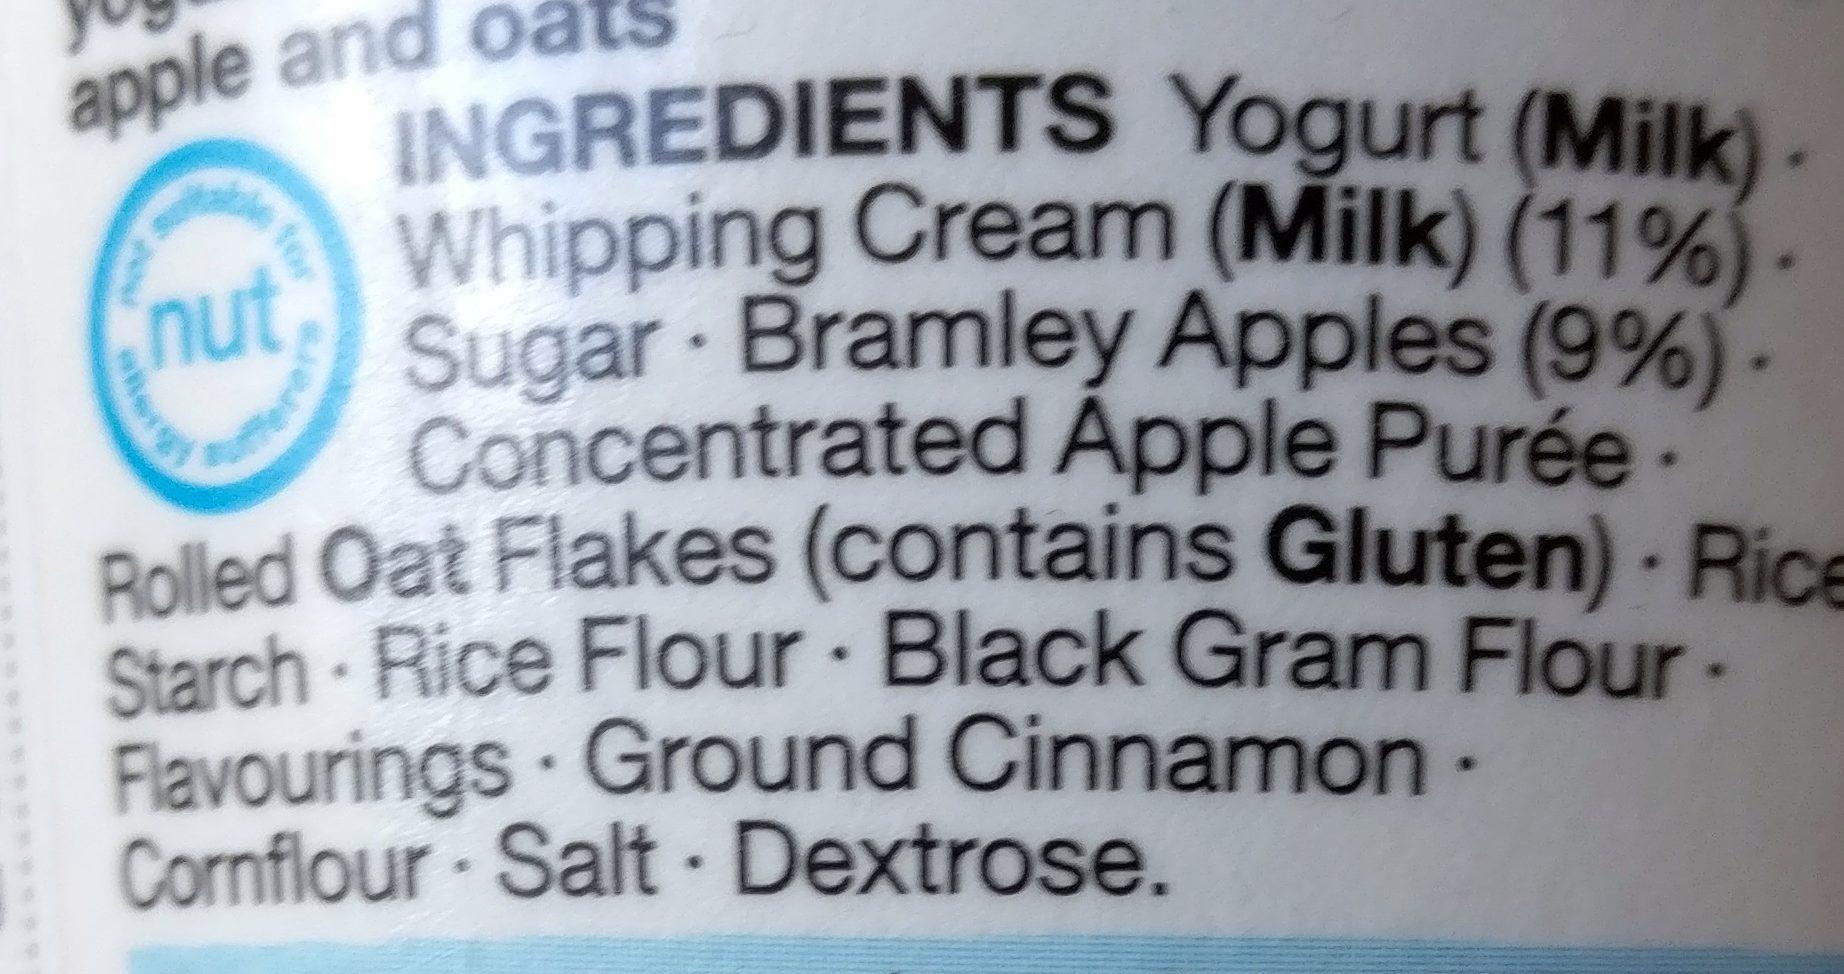 Yaourt Apple Crumble - Ingrediënten - en